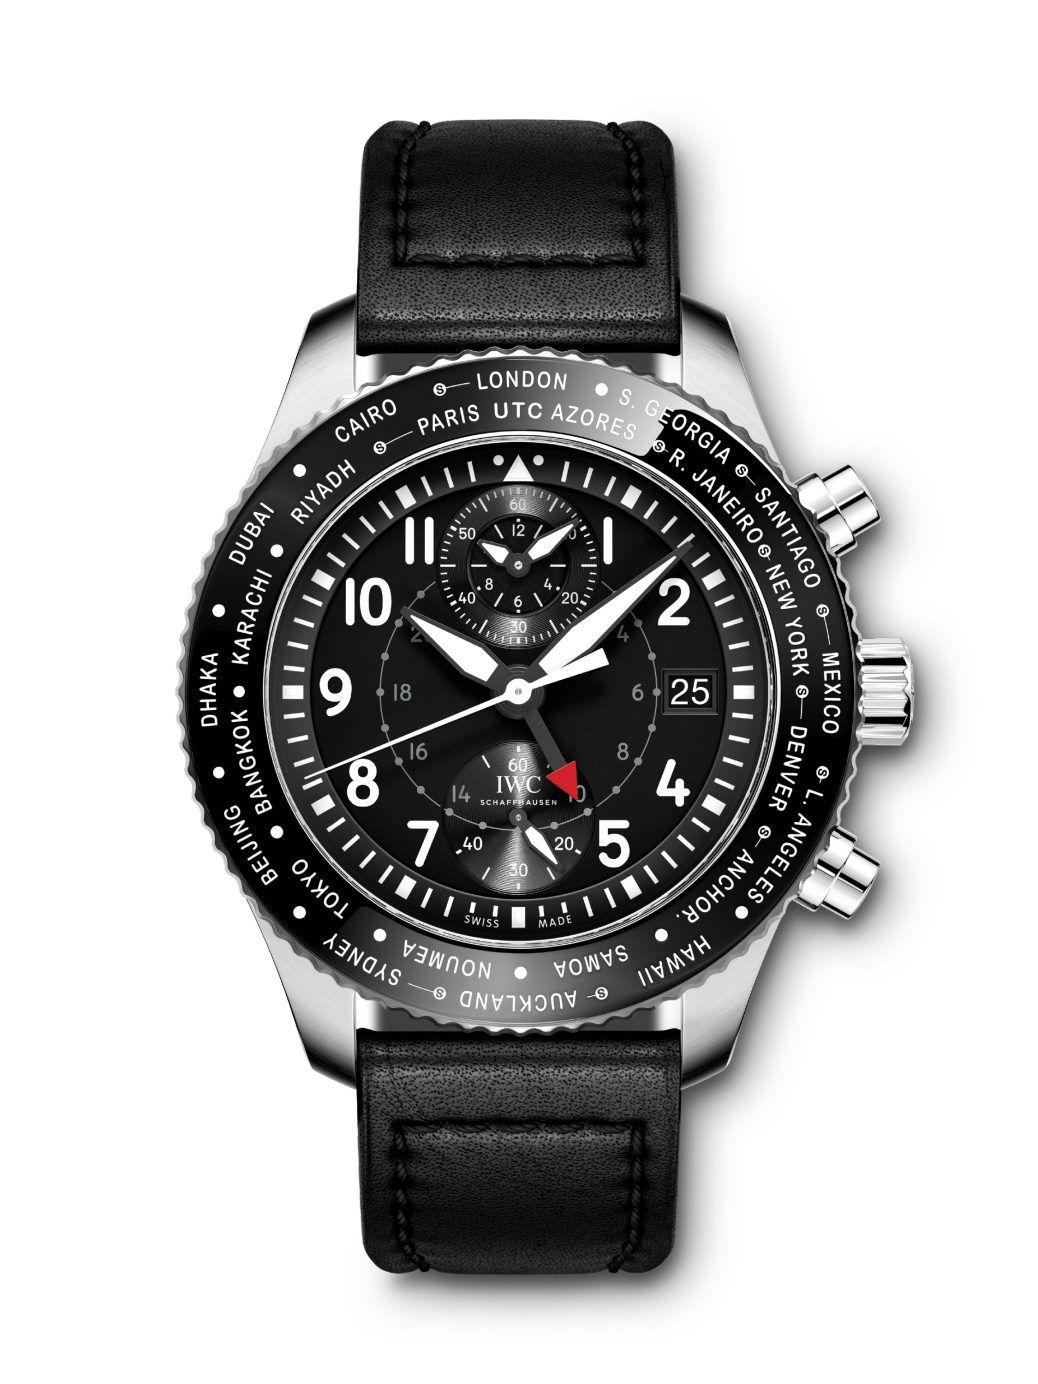 aeb8e1bcb16 IW395001-Pilot s Watch Timezoner Chronograph